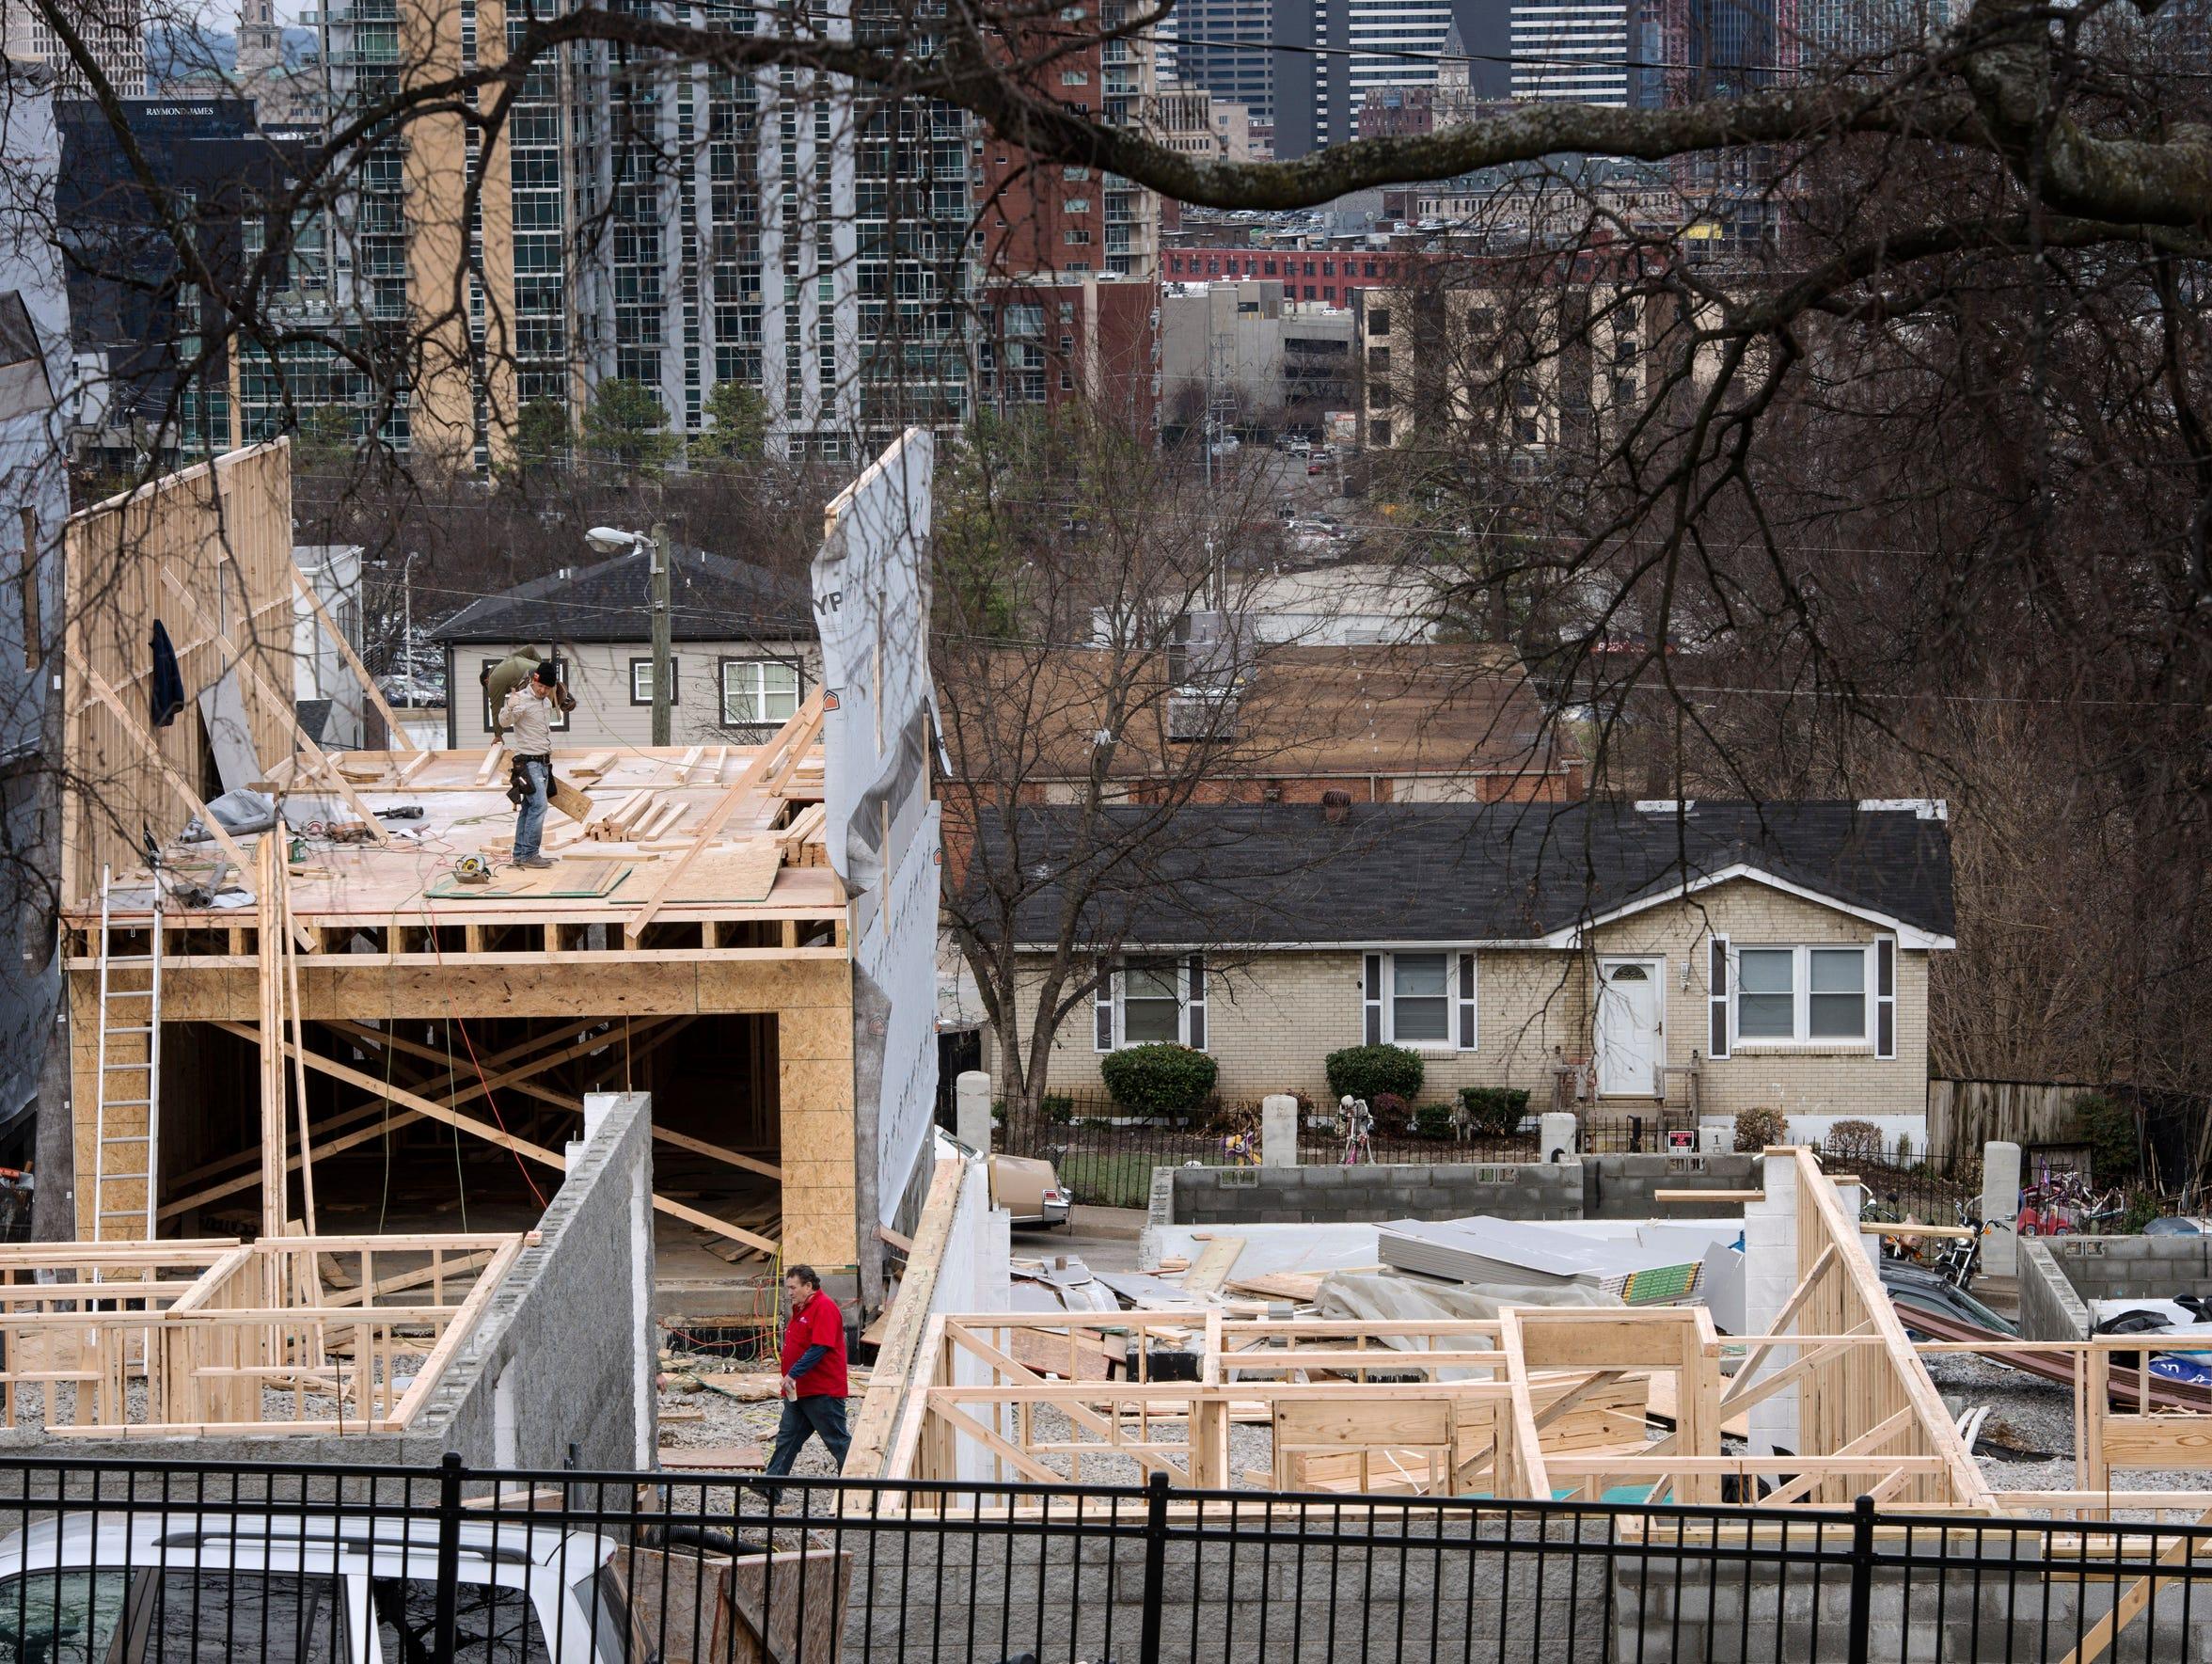 New houses go up along Archer Street in a neighborhood